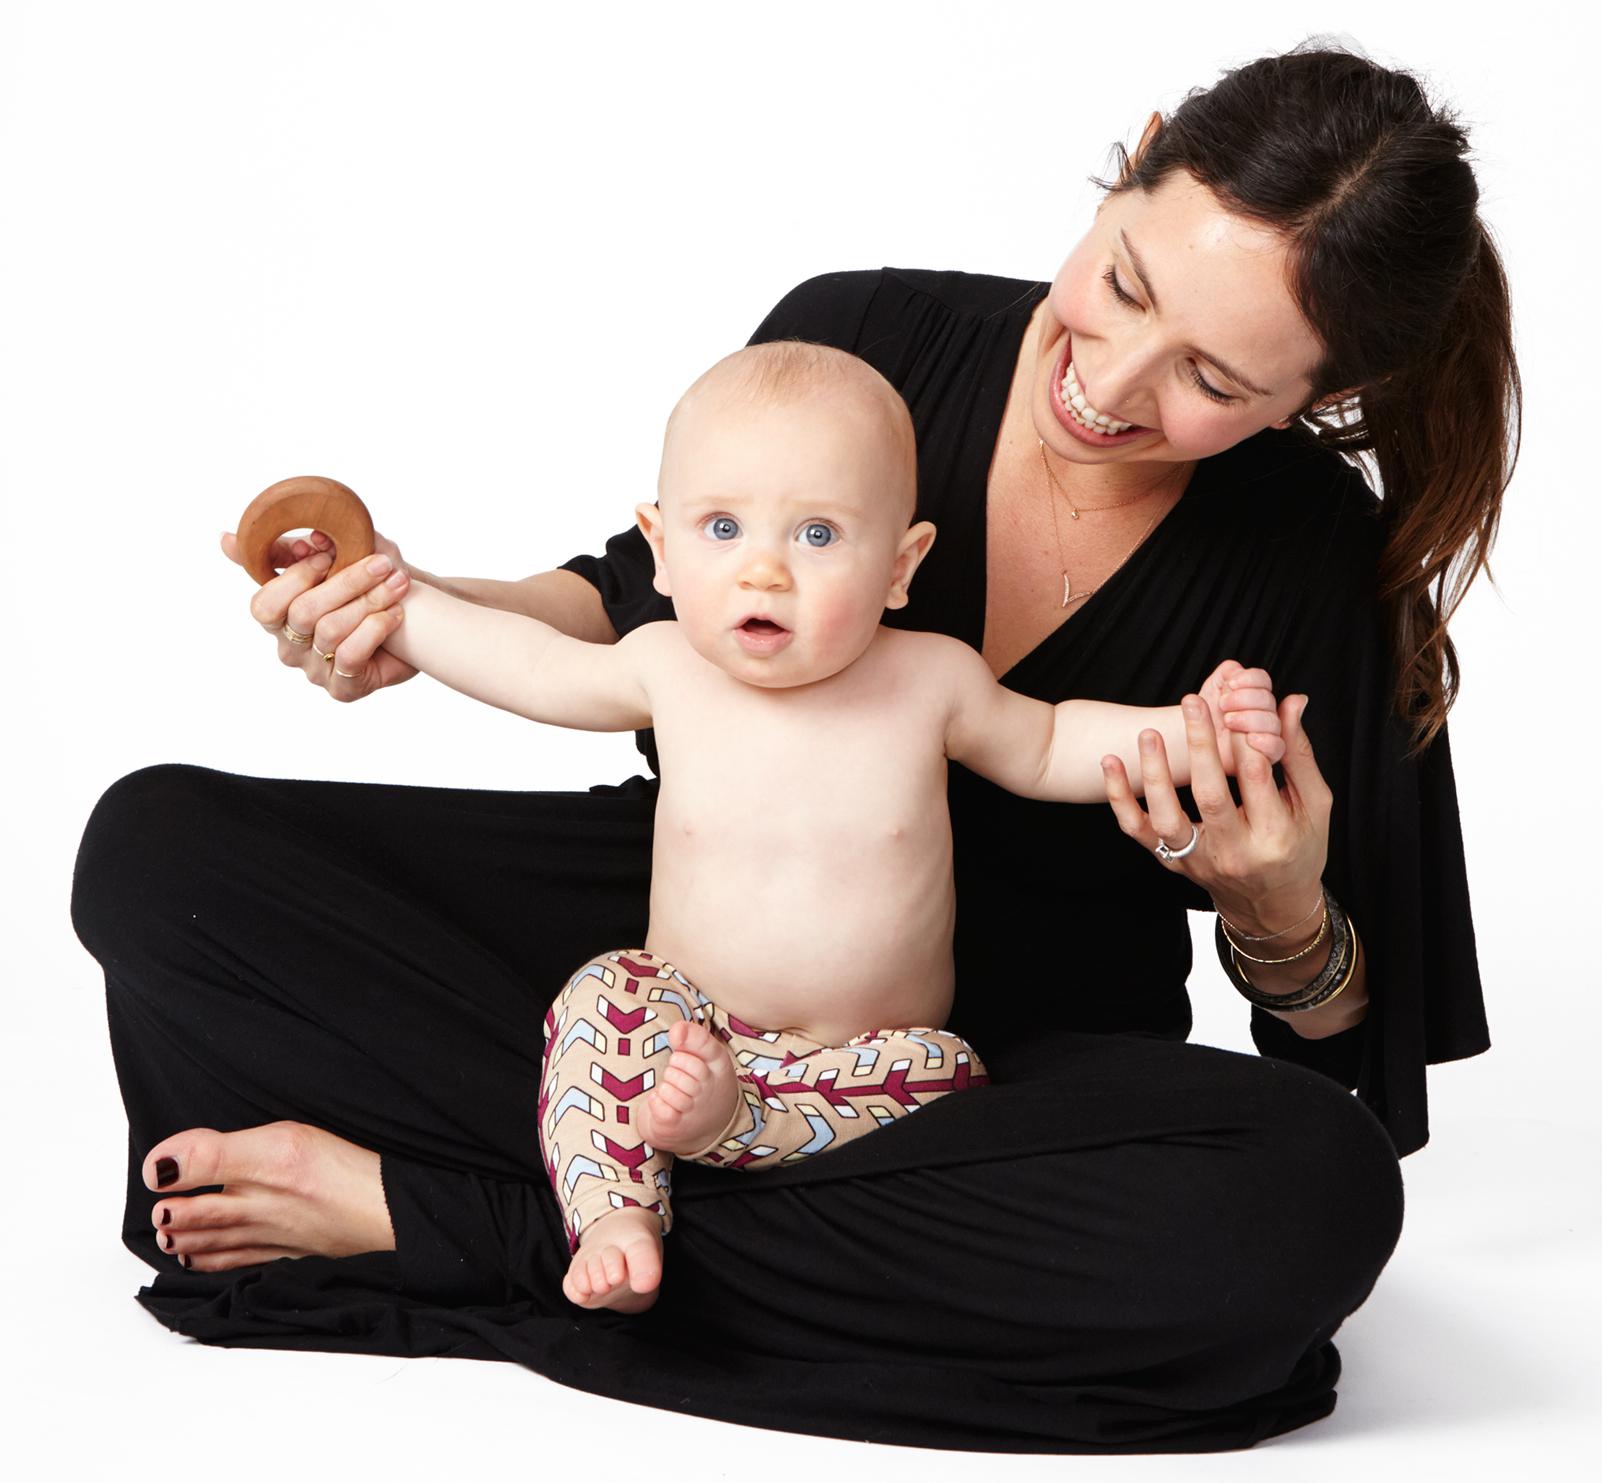 Rachel Pally Baby Clothes | TresChicNow.com #kids #baby #gifts #style #rachelpally